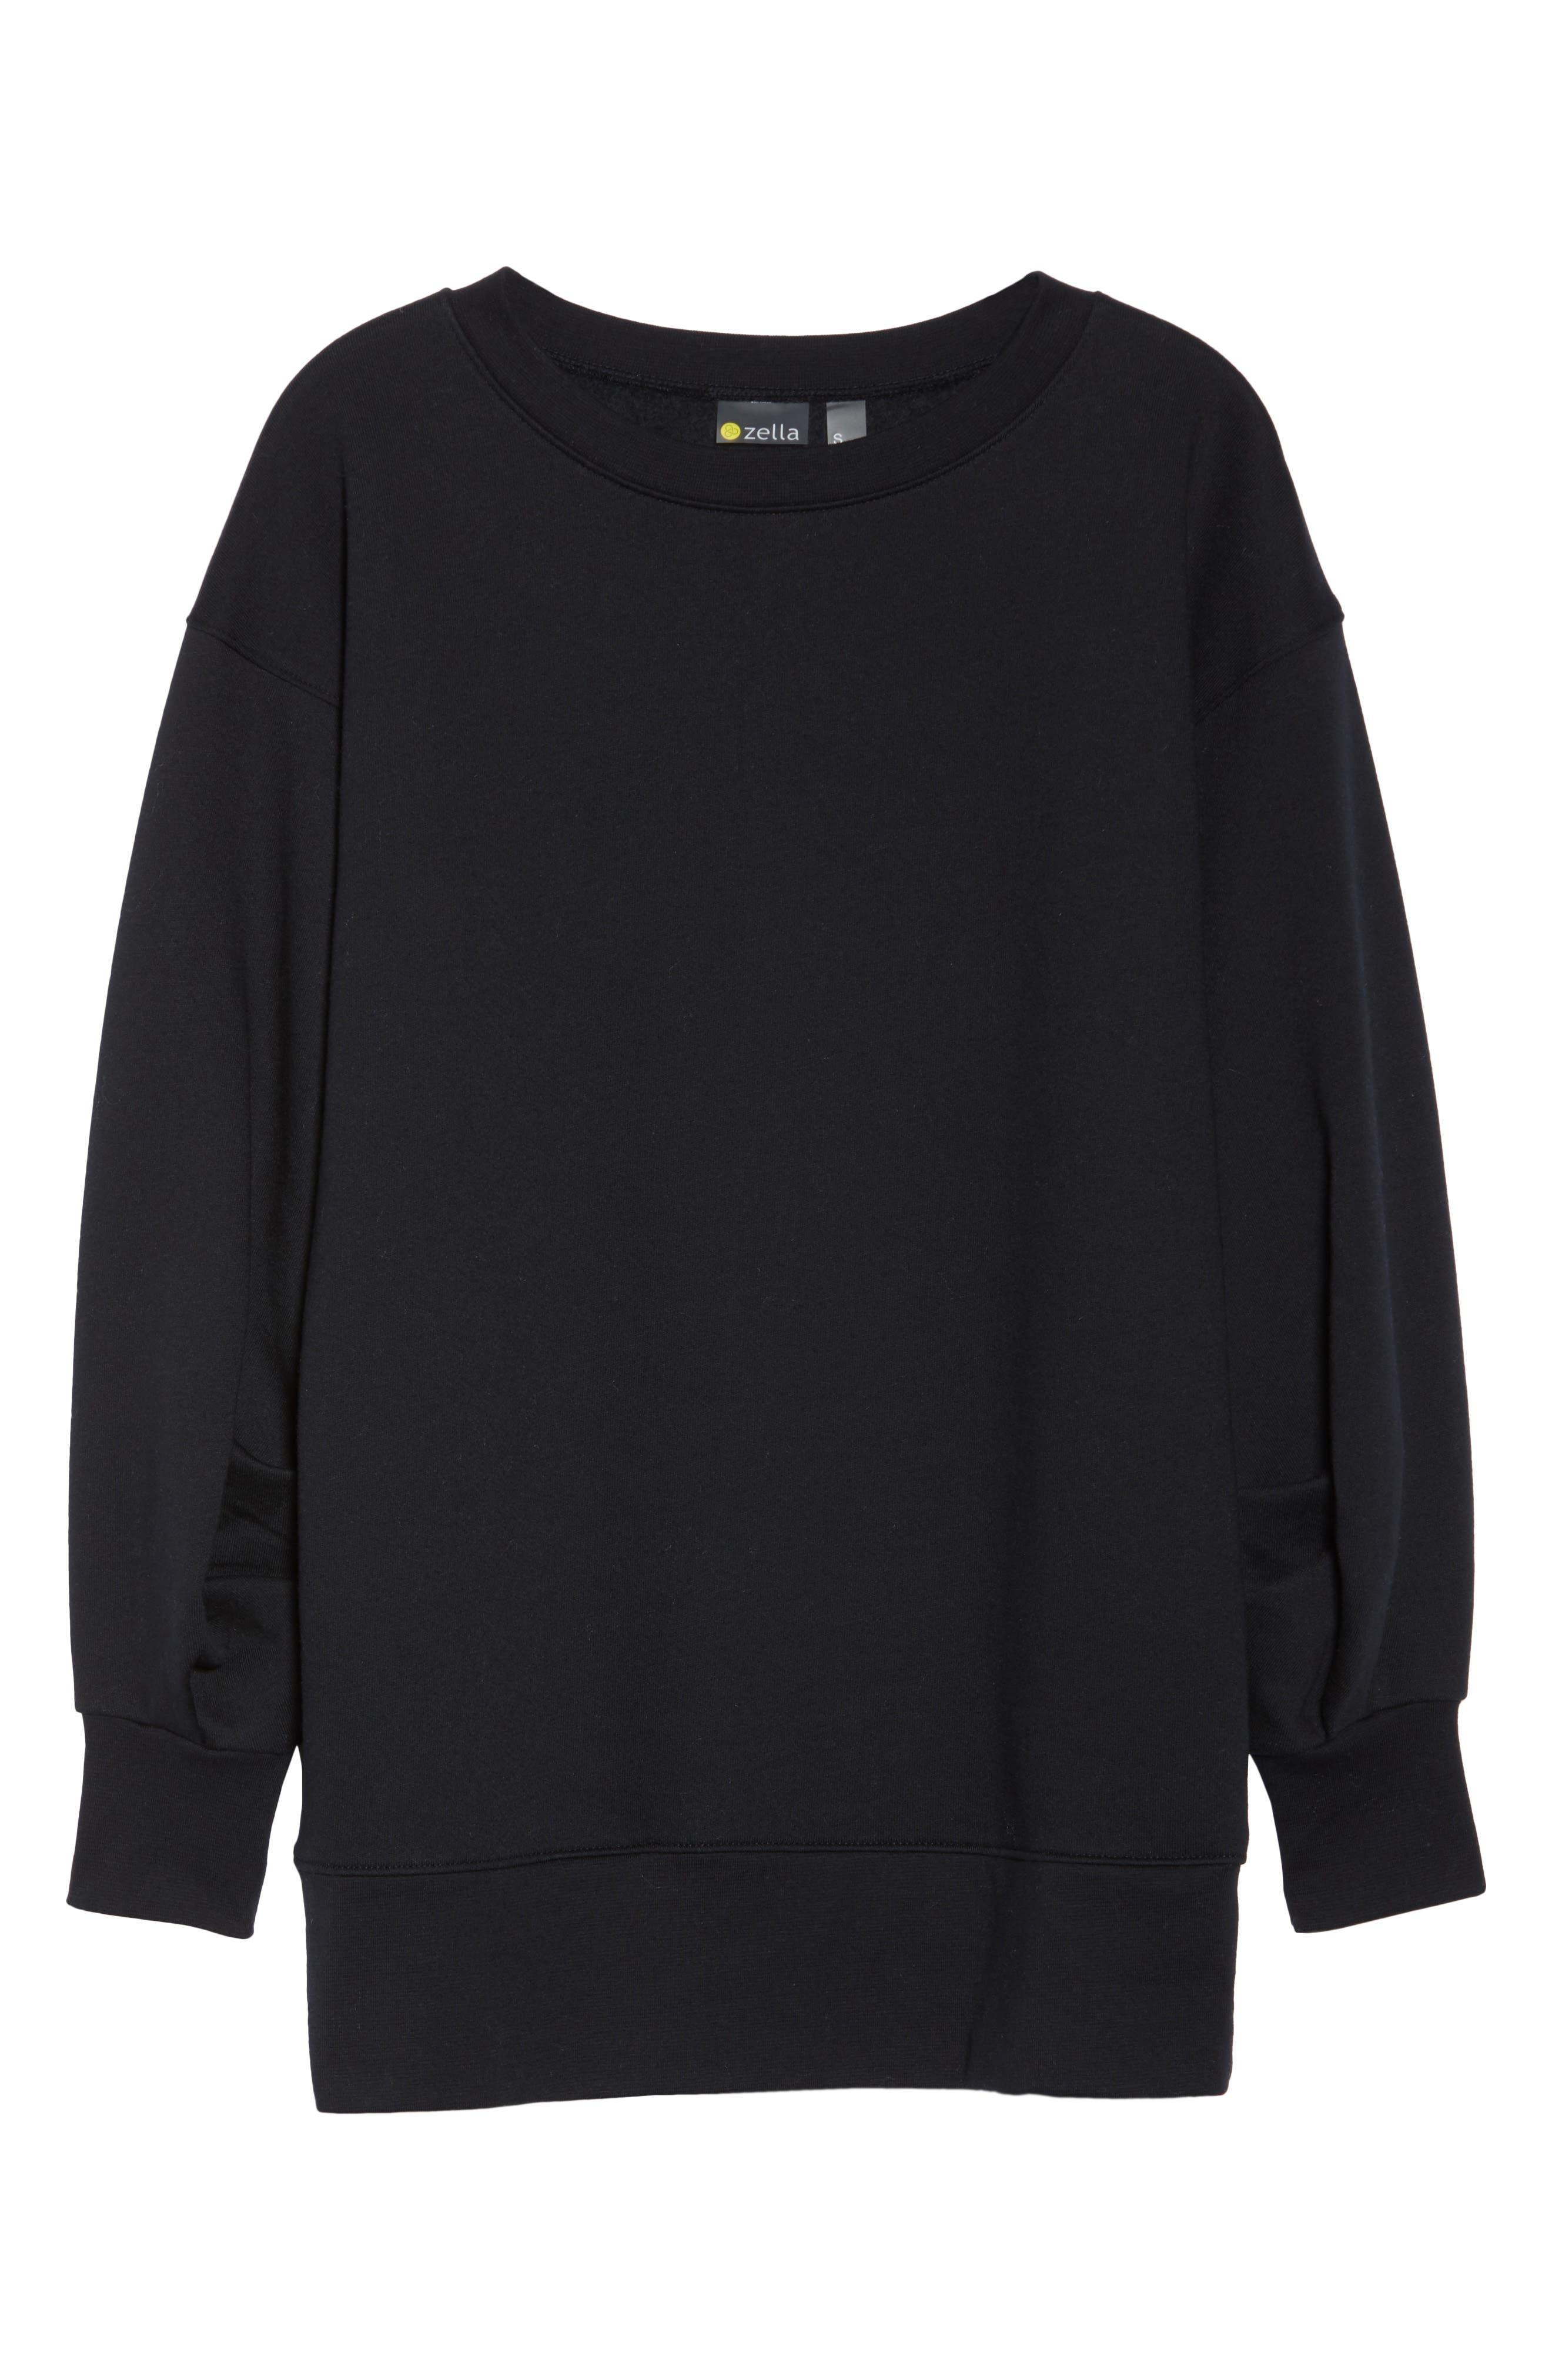 ZELLA,                             Boxy Oversize Sweatshirt,                             Alternate thumbnail 7, color,                             001